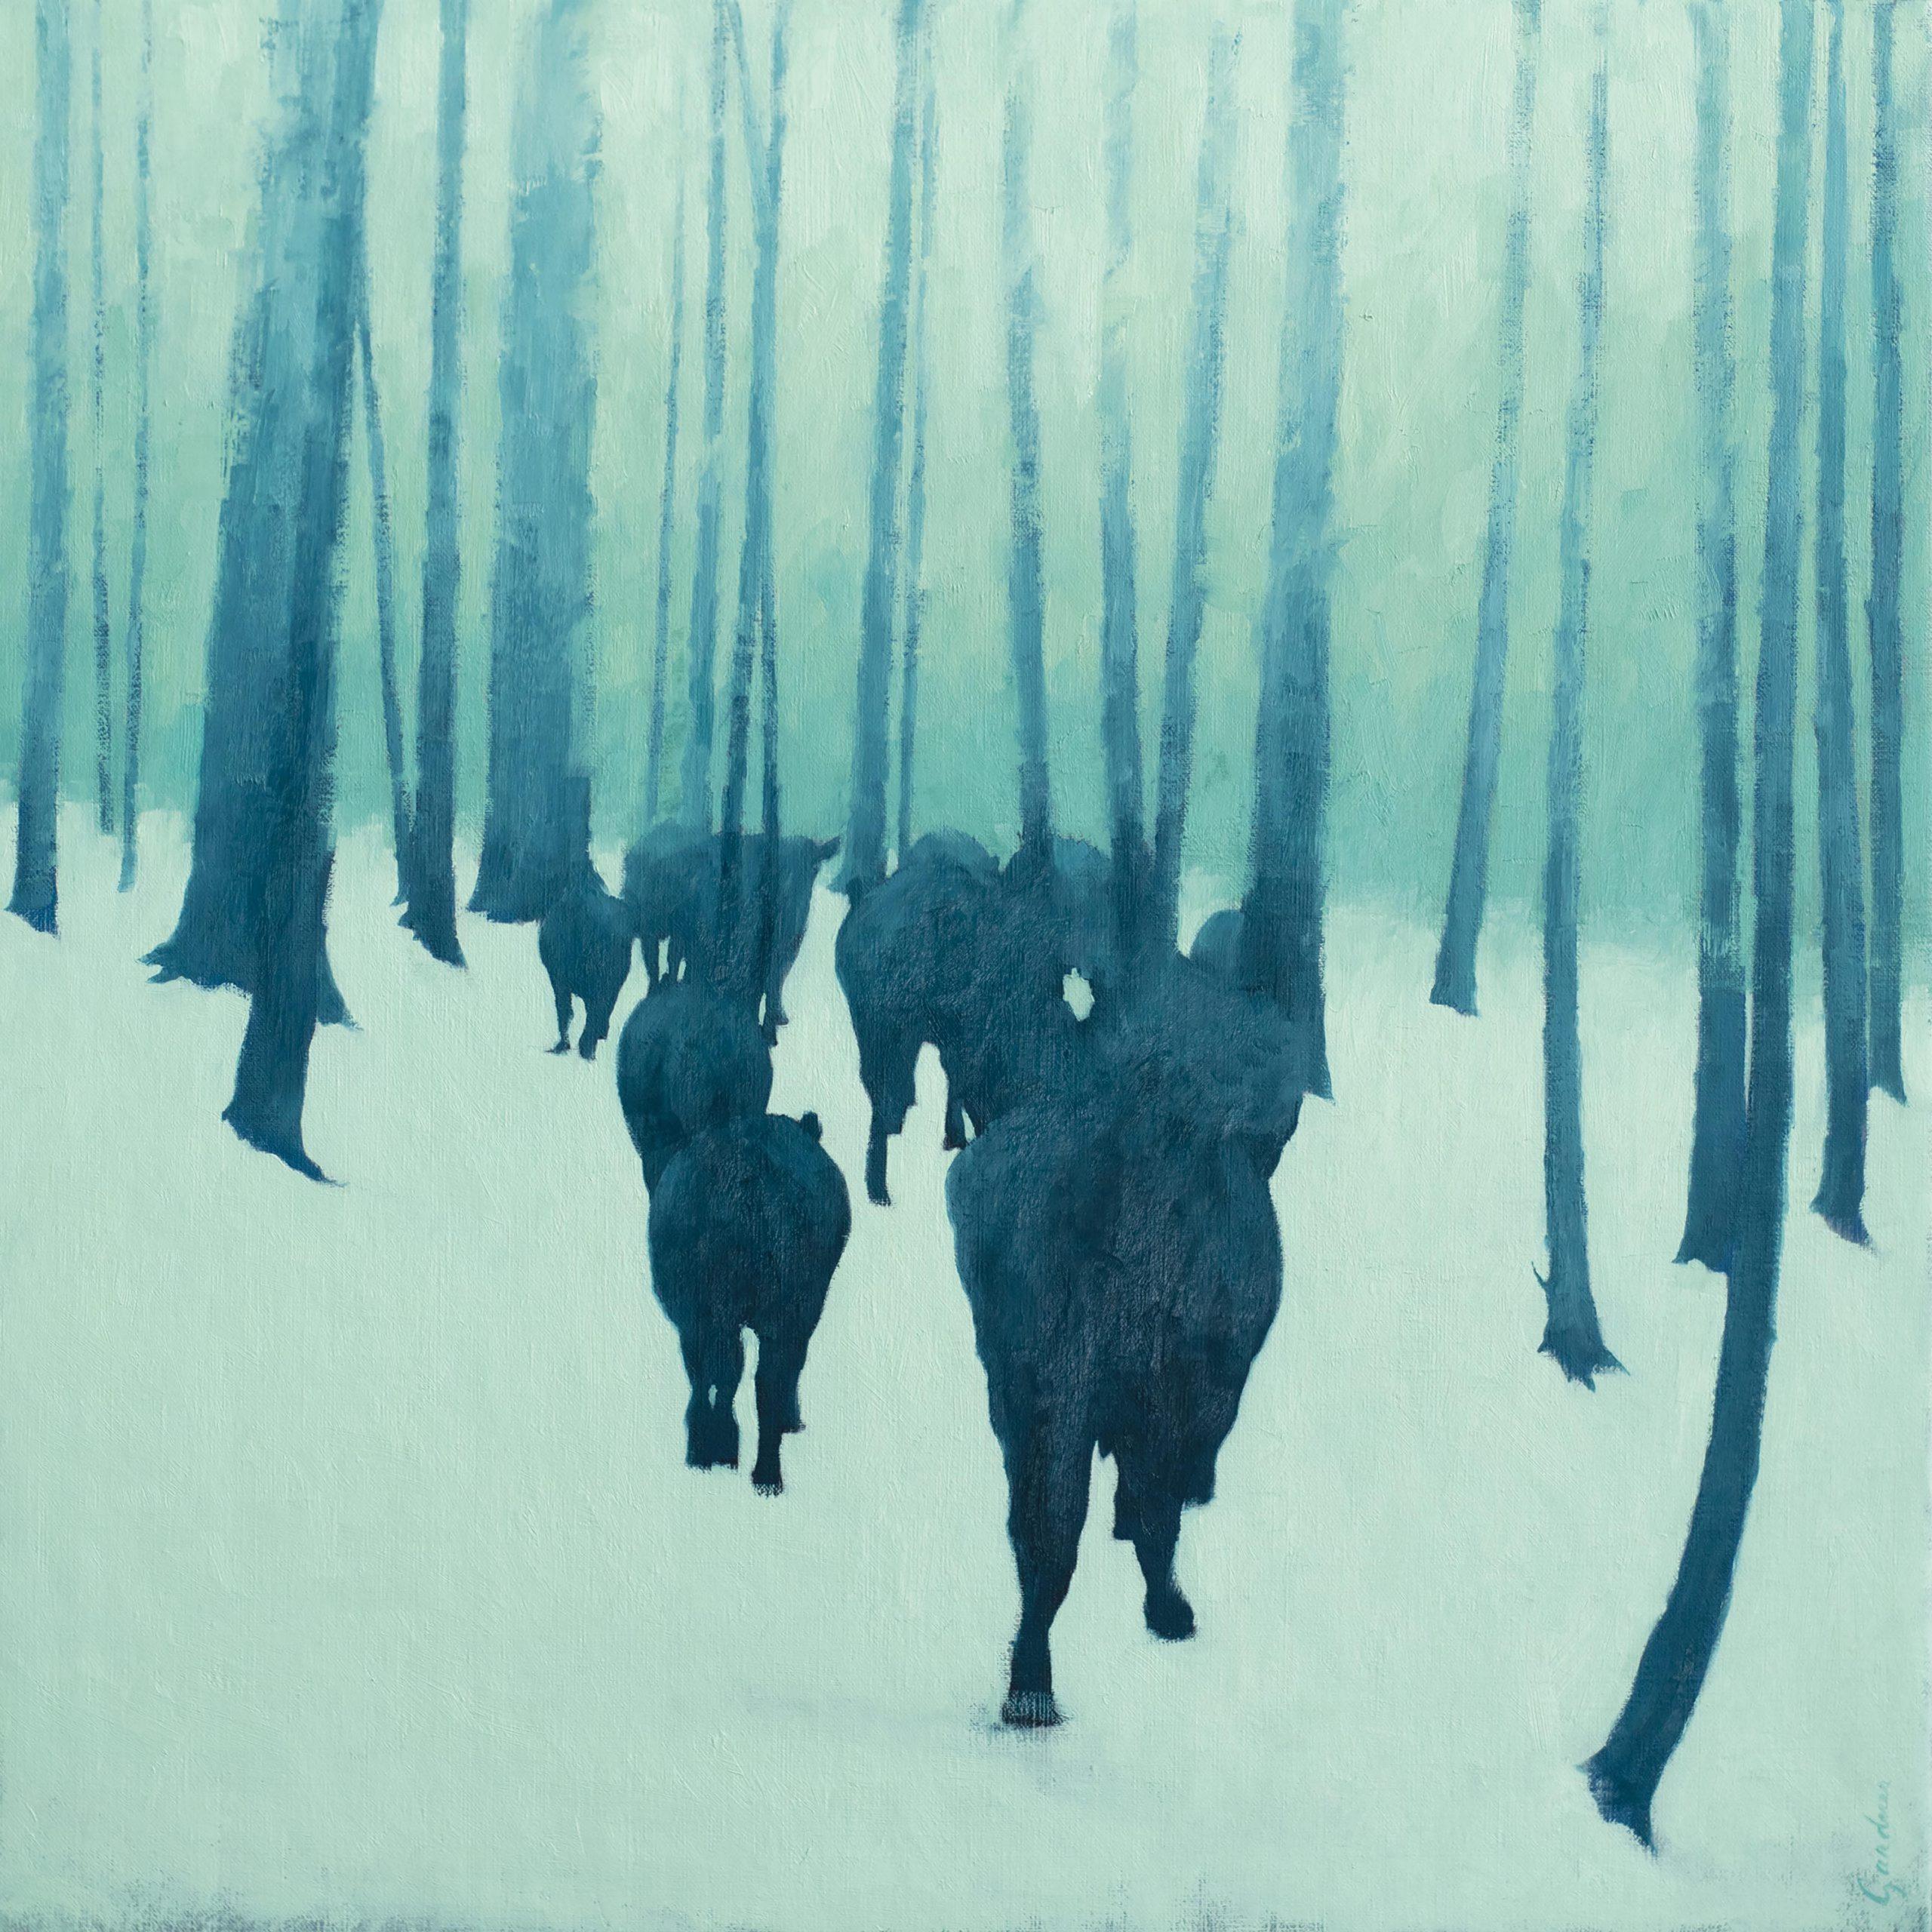 Terry  Gardner - A Rancher's Winter